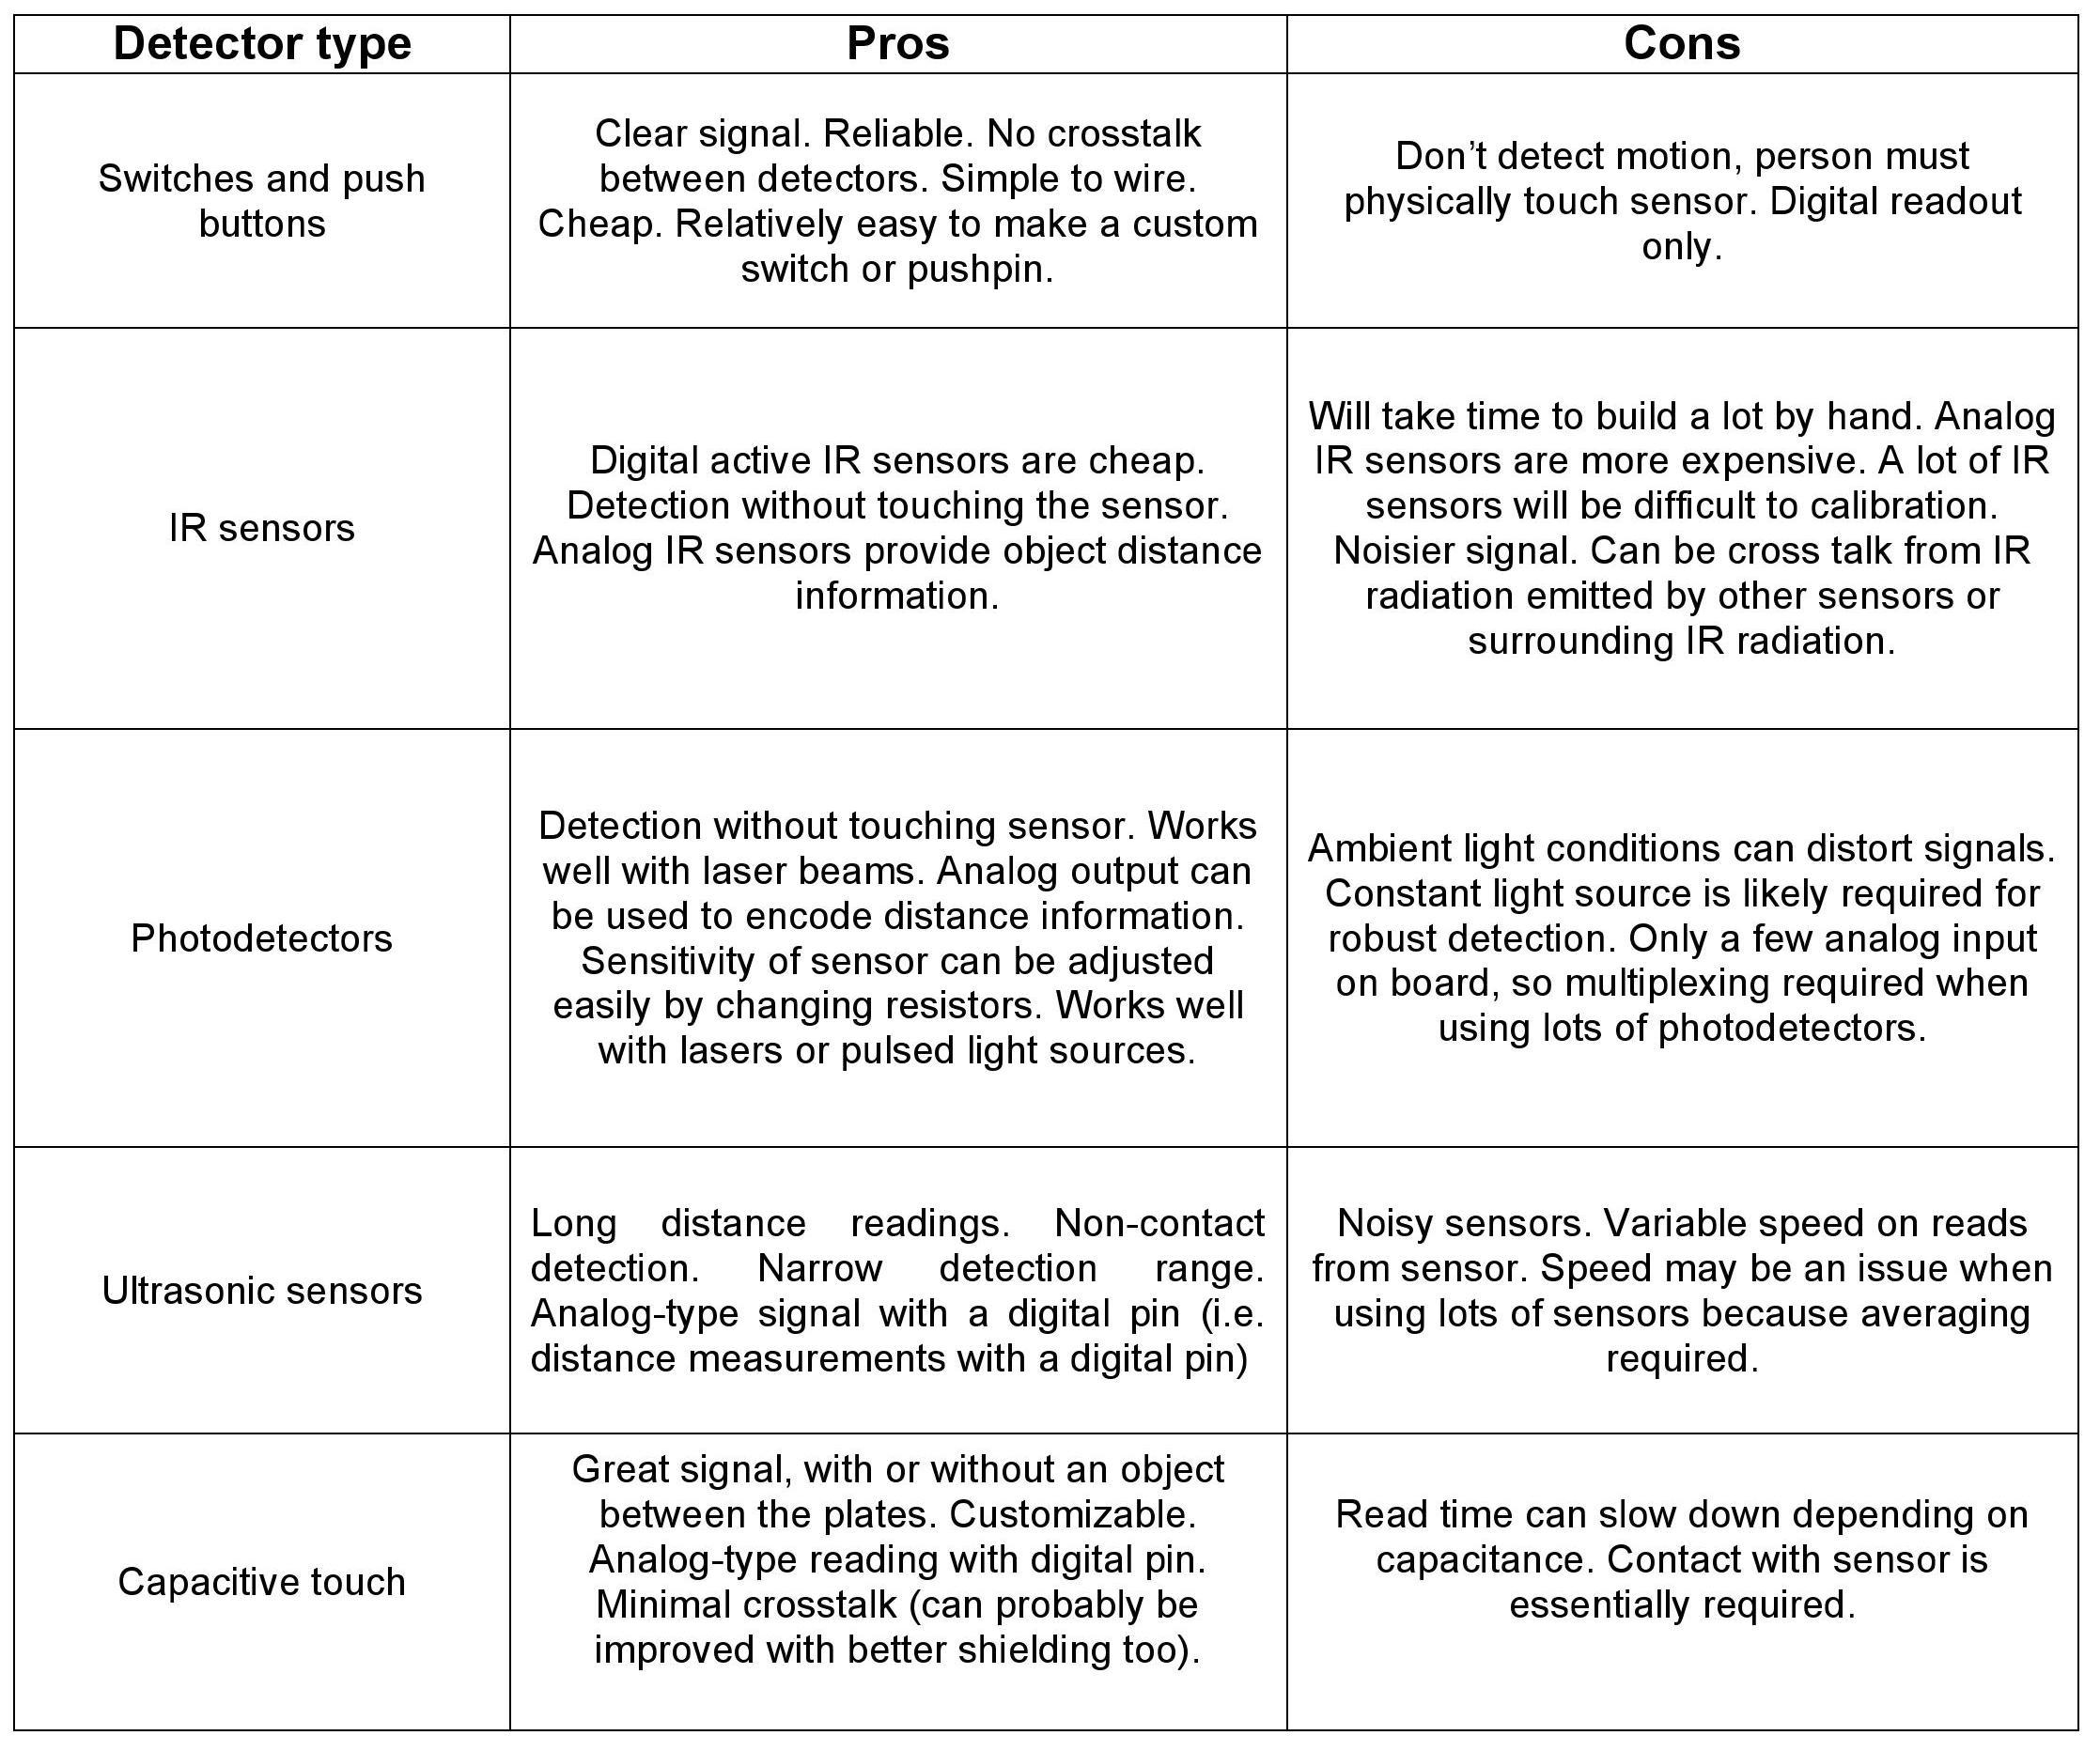 Picture of Comparison of Sensors